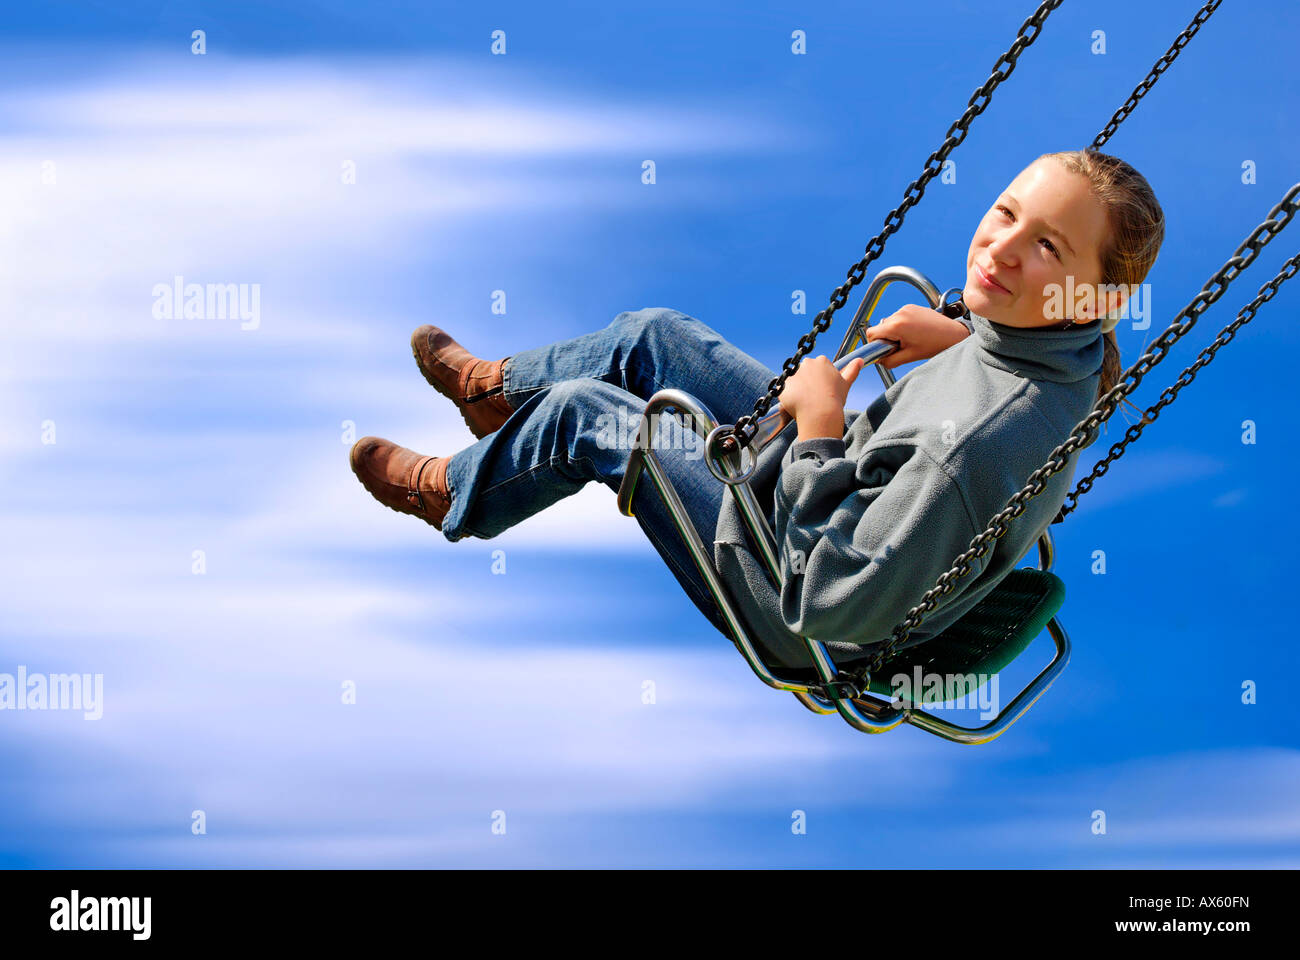 Girl on a swing carousel Stock Photo